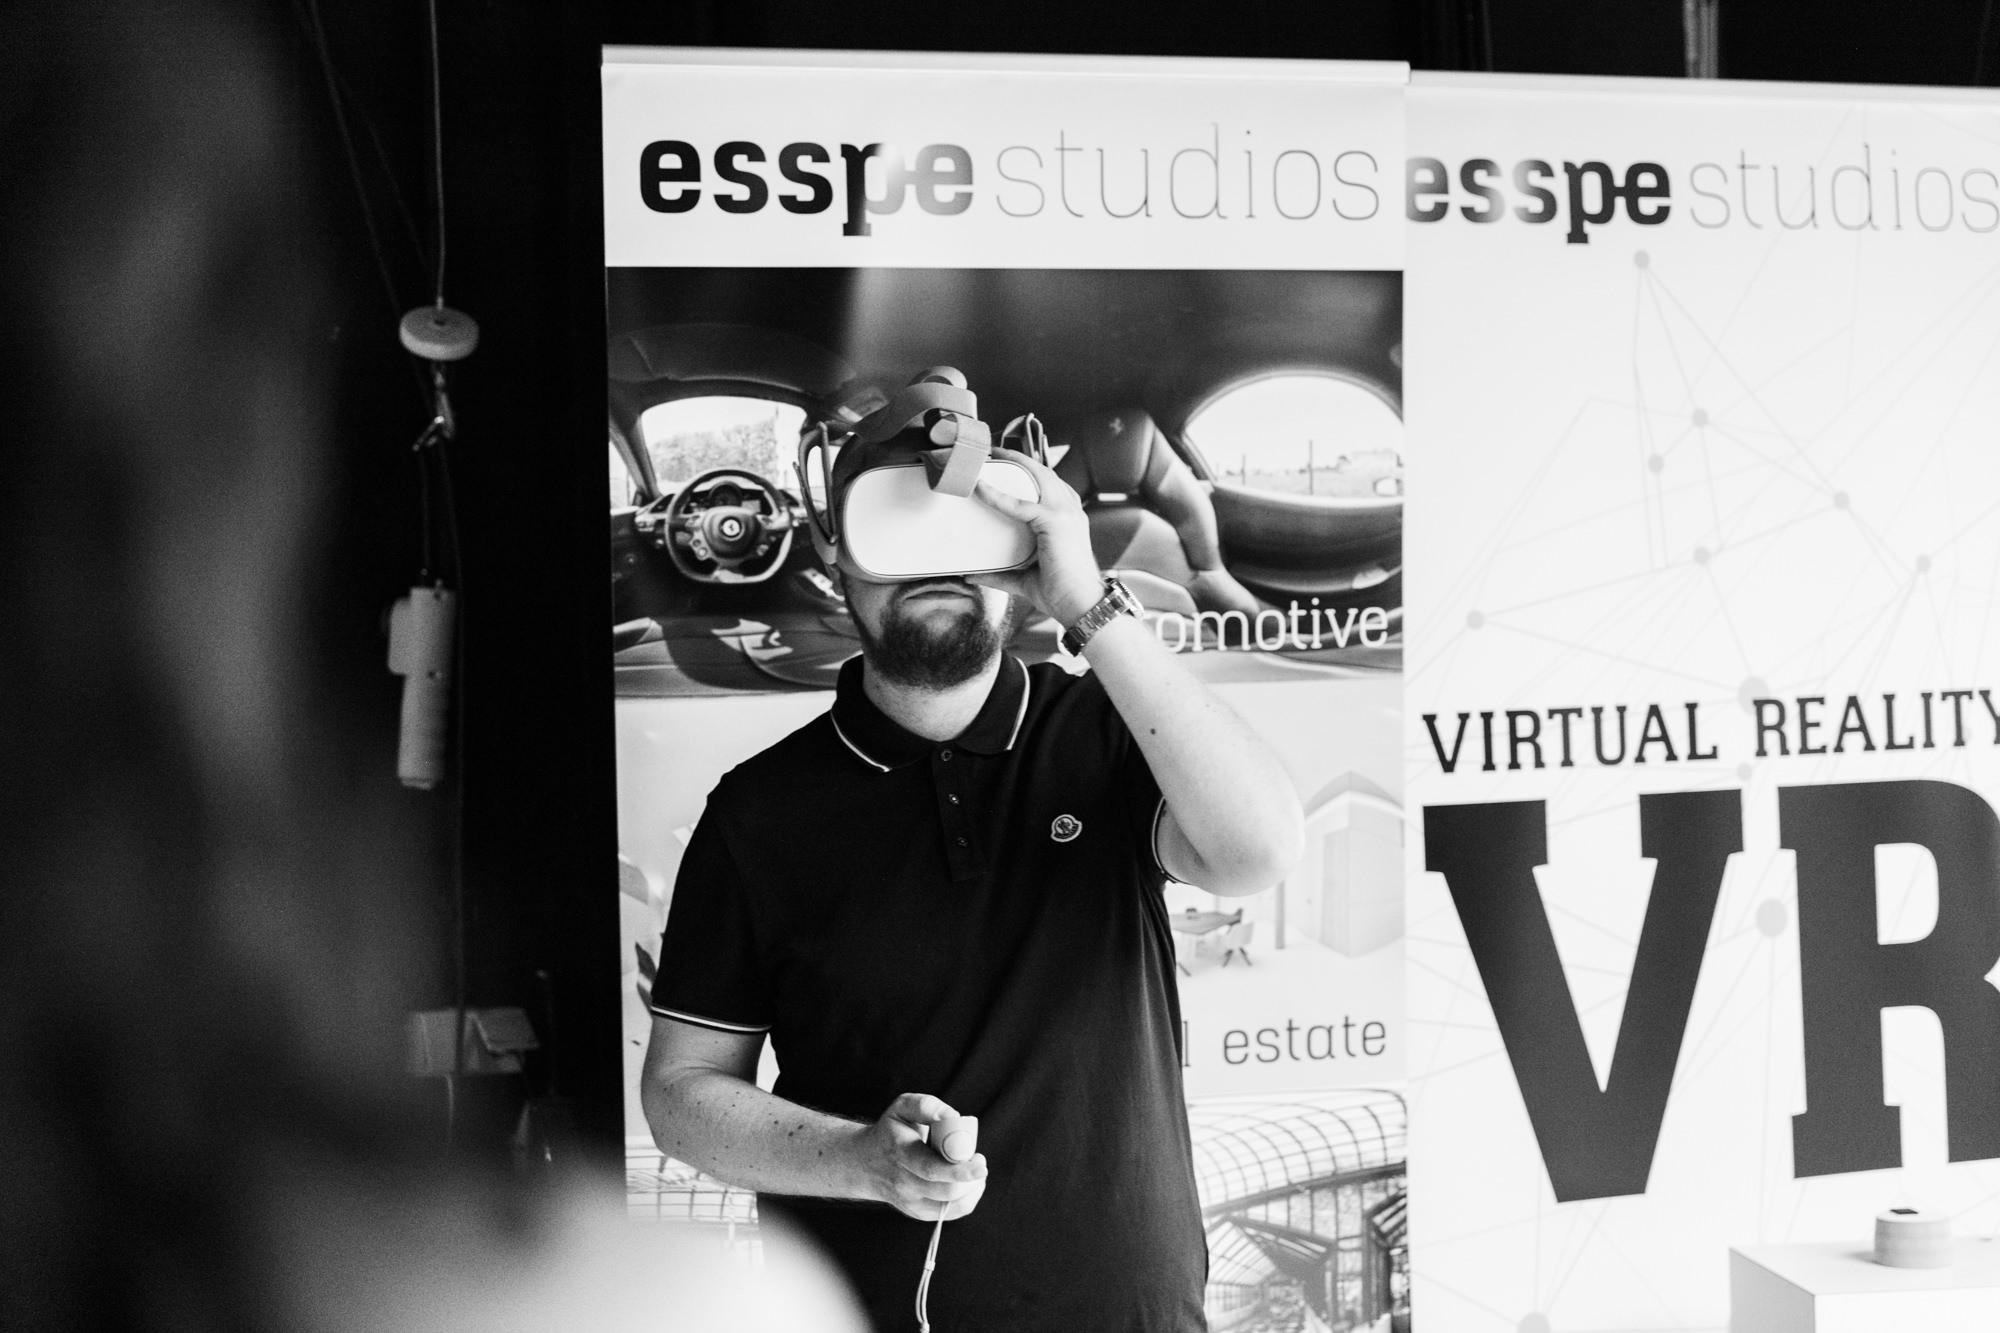 2019_07_01_Vernissage_ESSPE_Studios_018.jpg